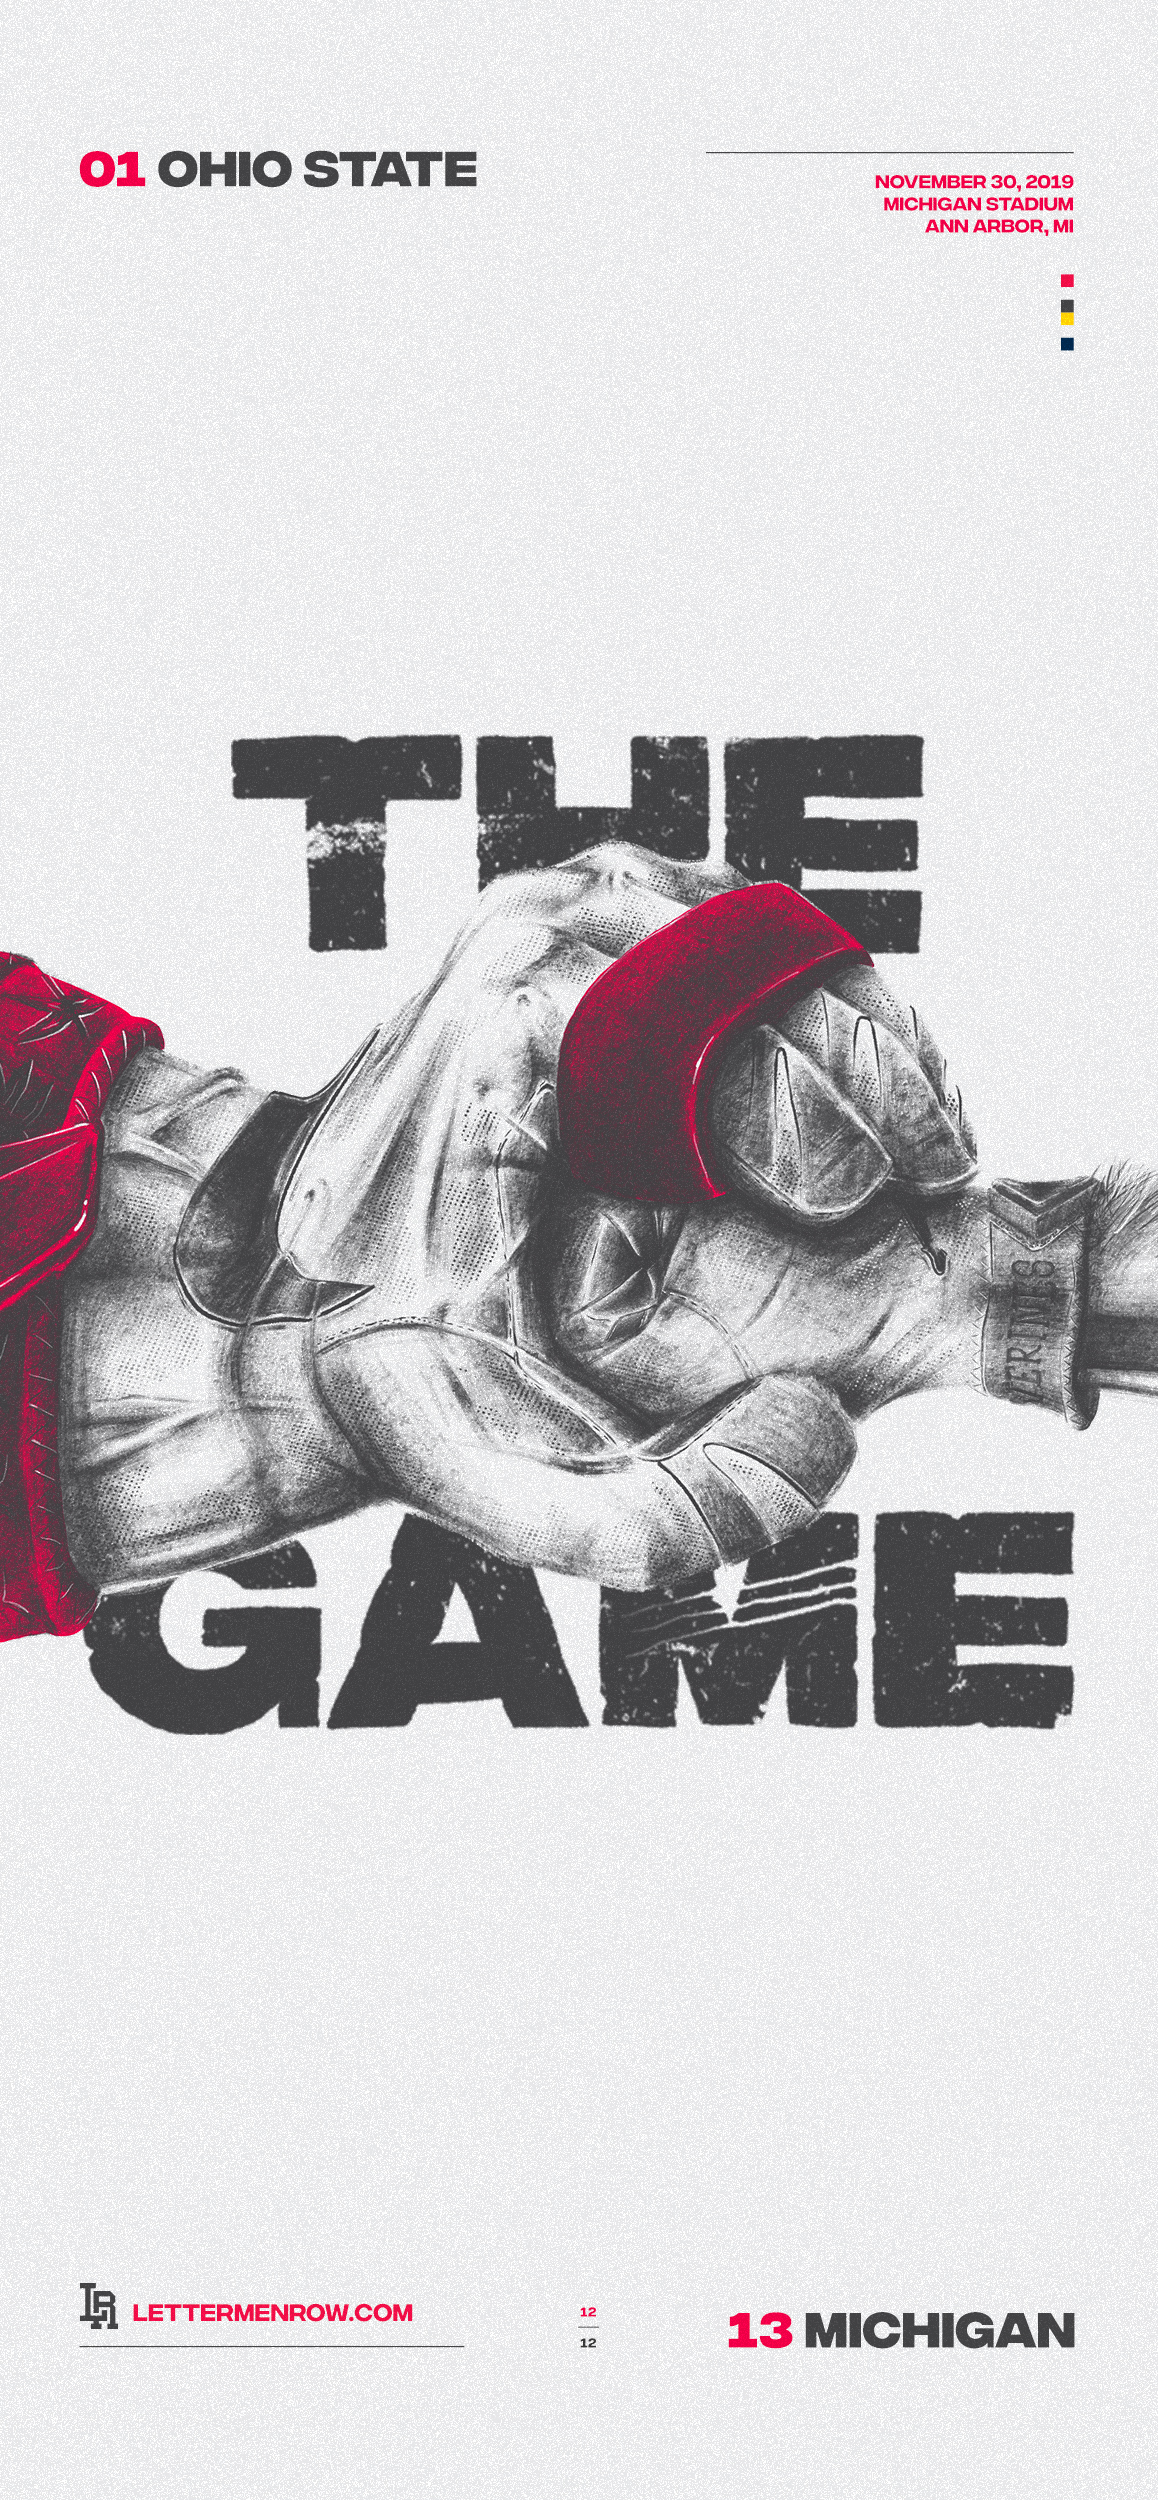 Ohio State-Ohio State football-buckeyes-game poster-iphonex